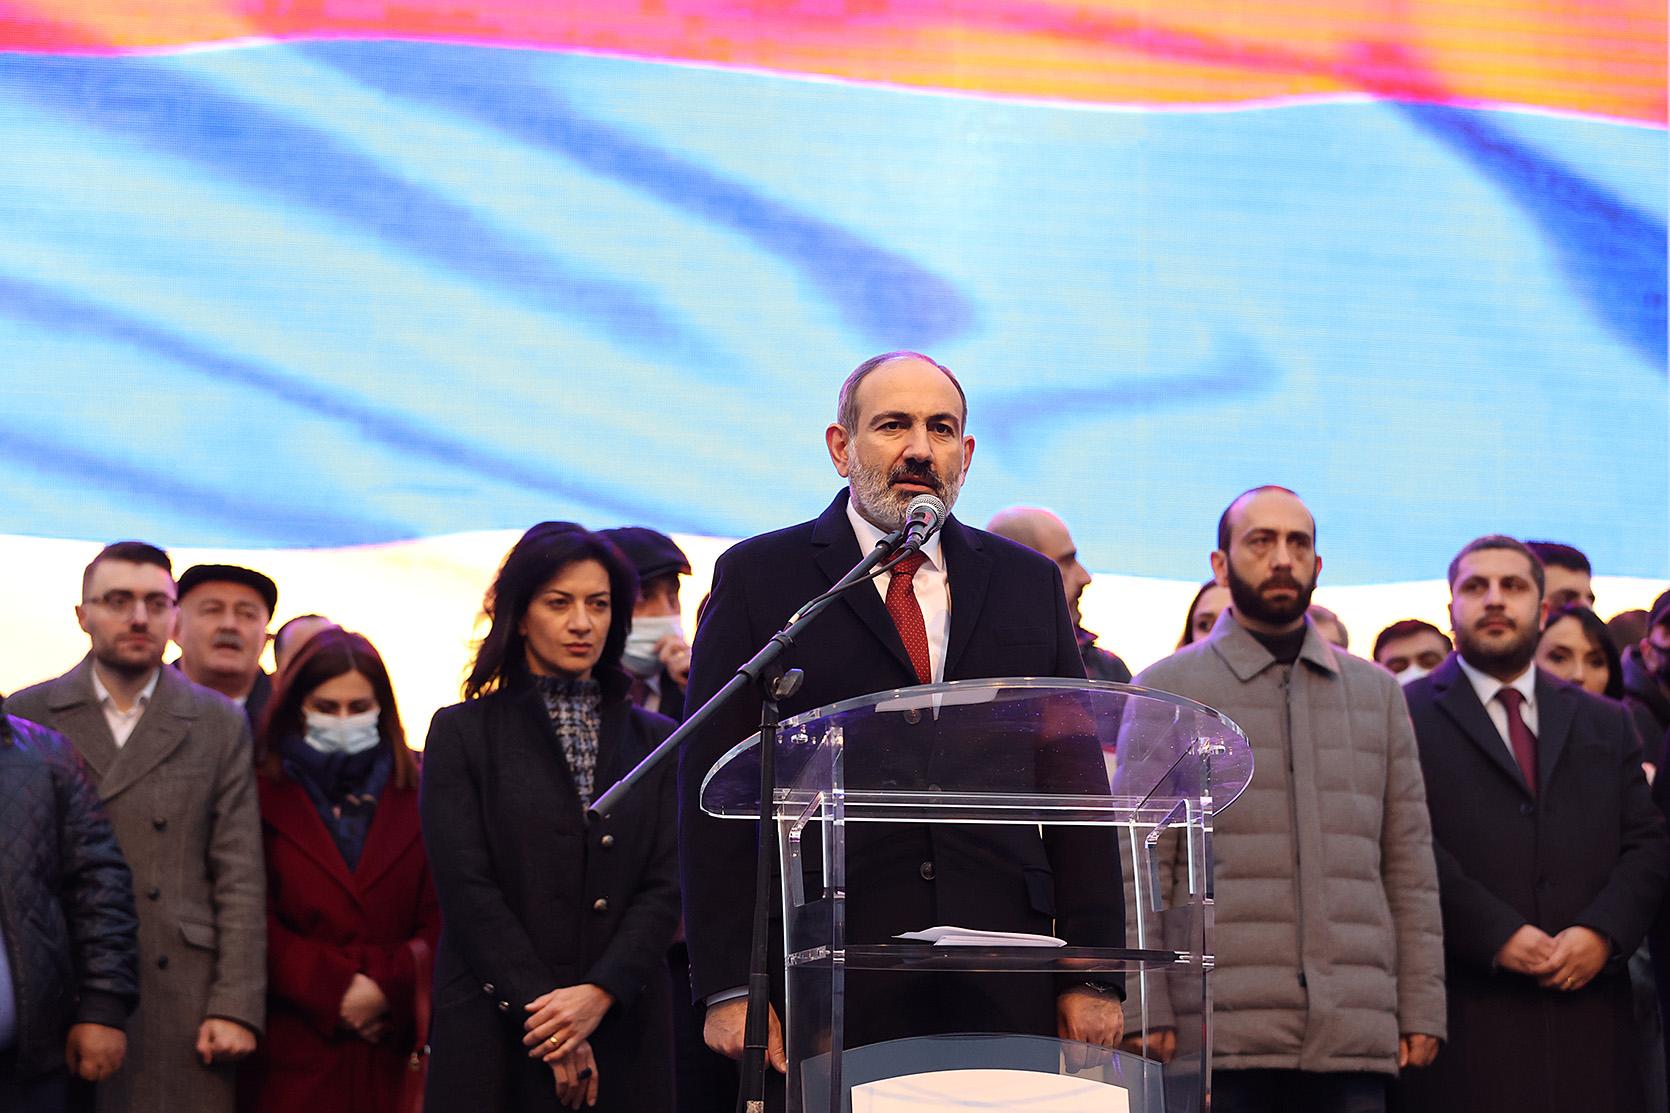 Photo of «Ժողովուրդն անհաղթահարելի ուժ է». վարչապետի ելույթը Հանրապետության հրապարակում հանրահավաքի ժամանակ